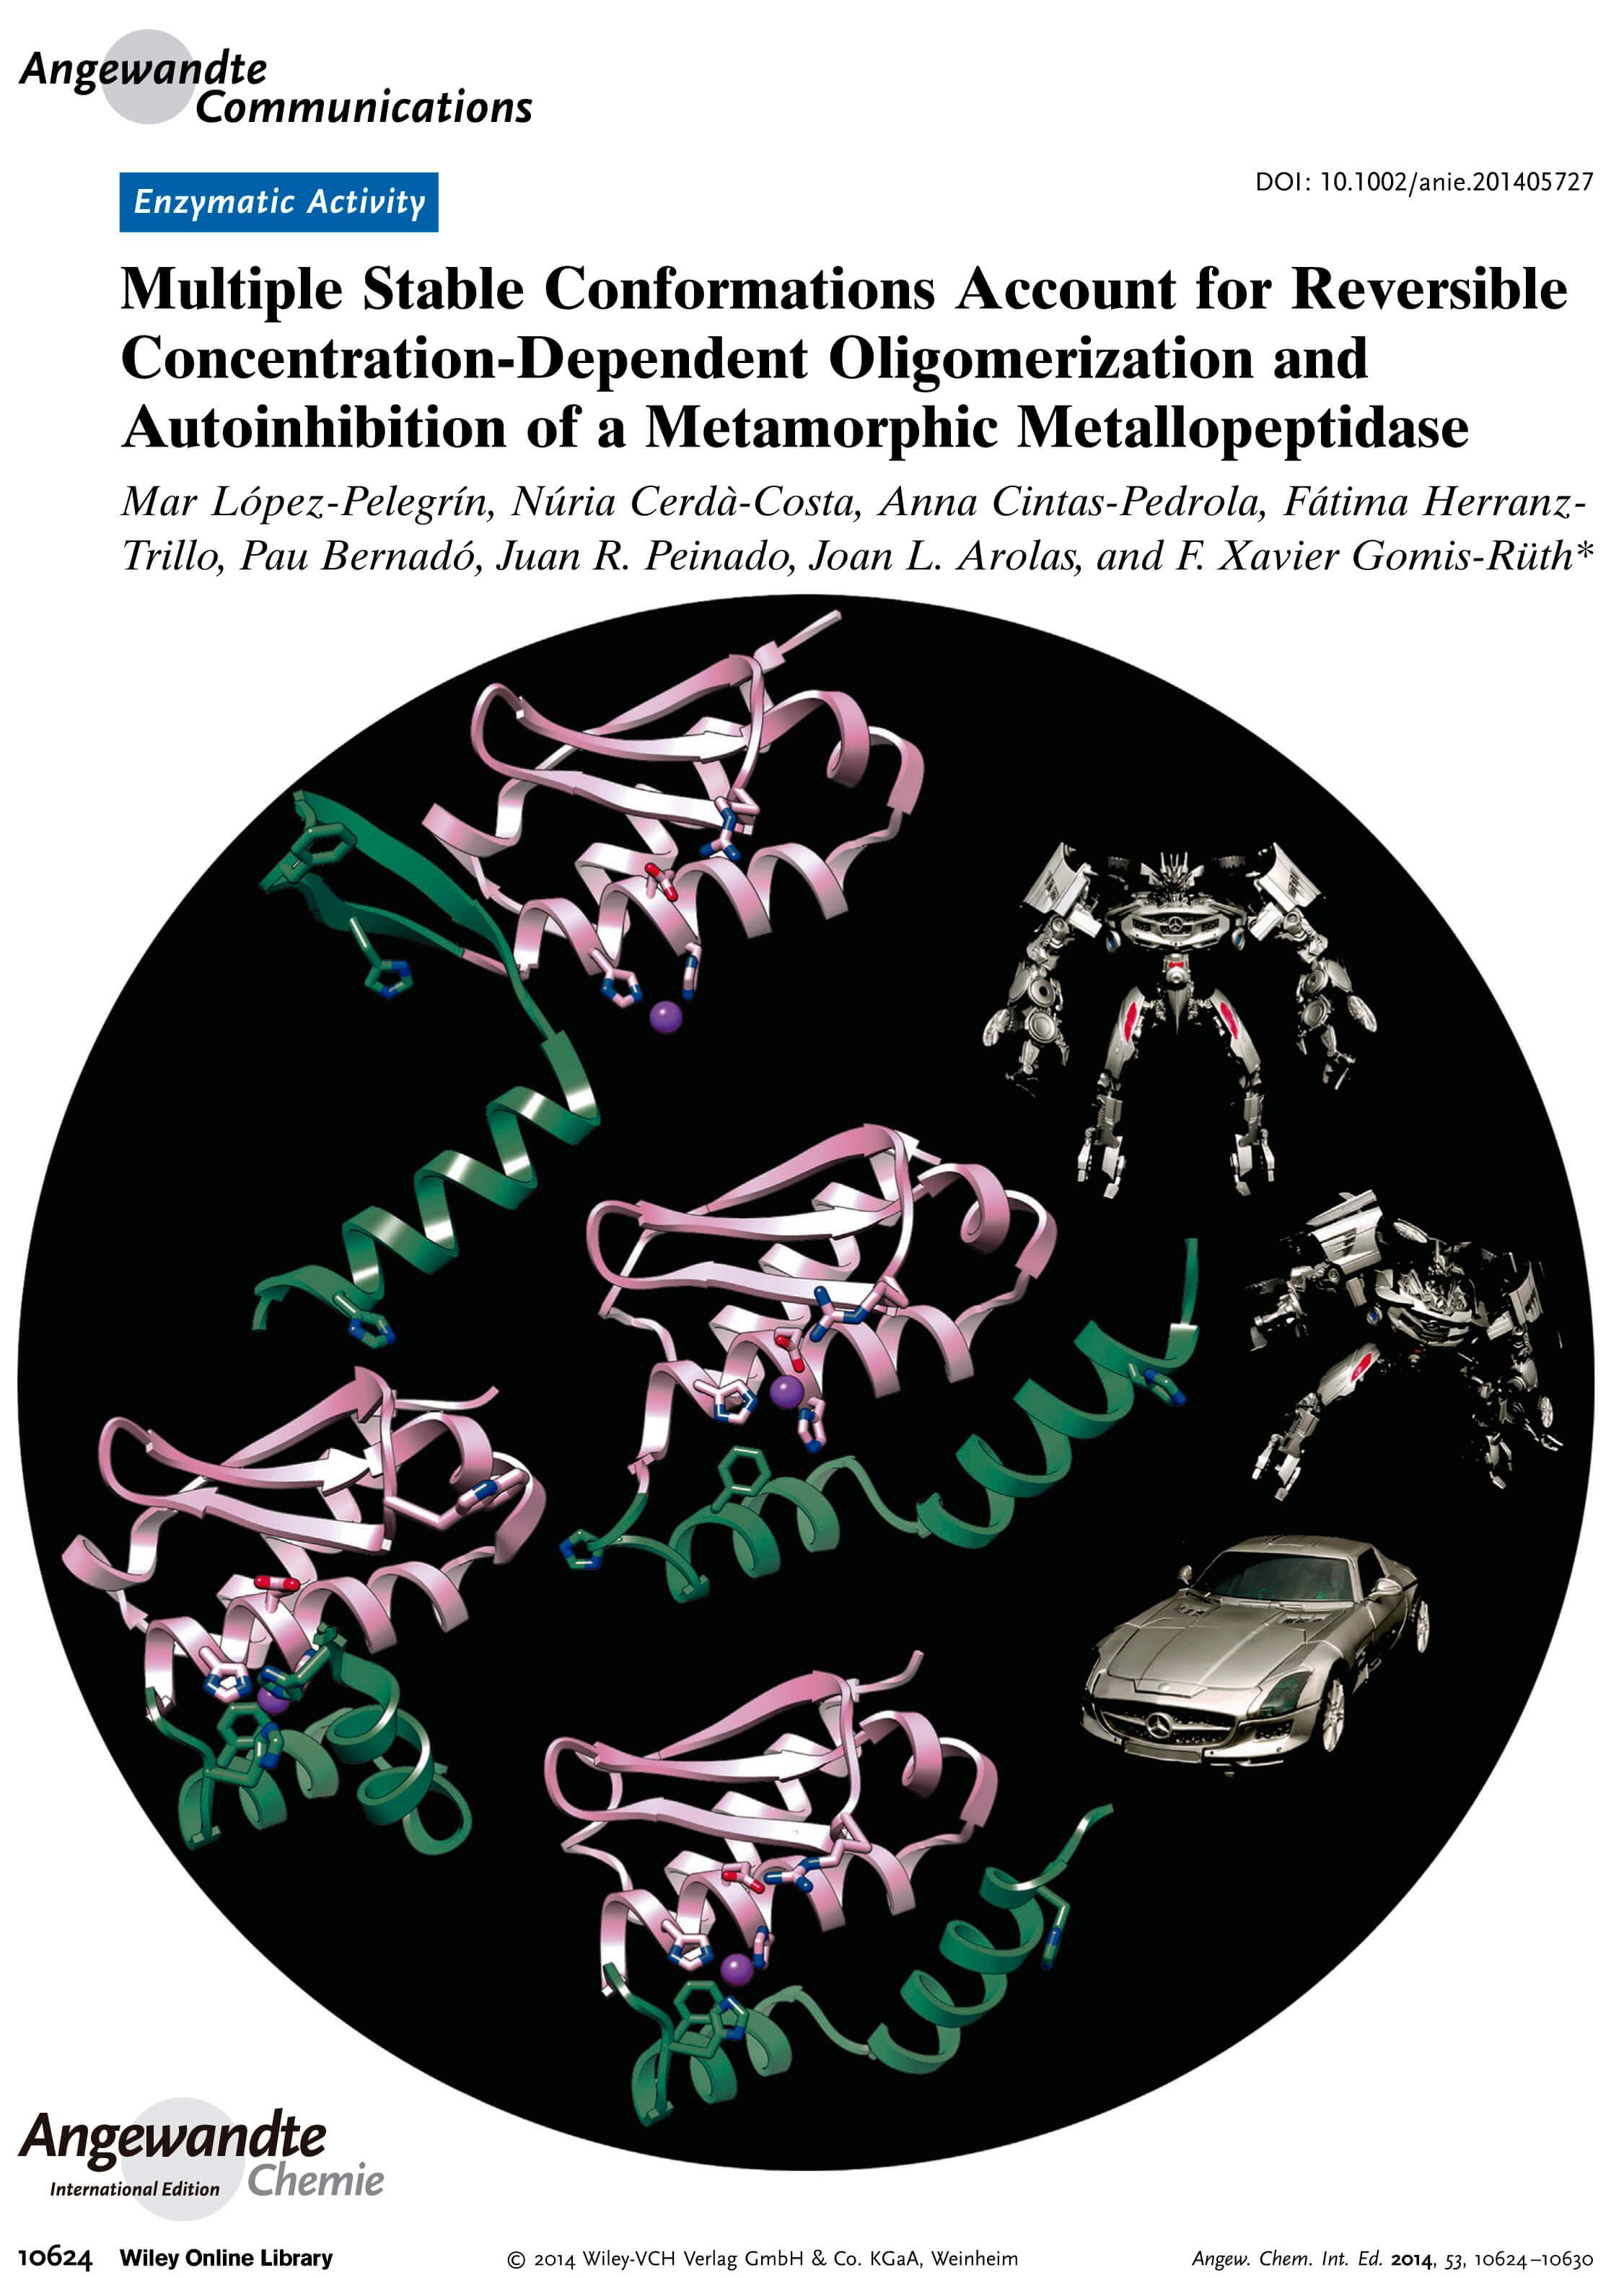 Methanococcus jannaschiiselecase